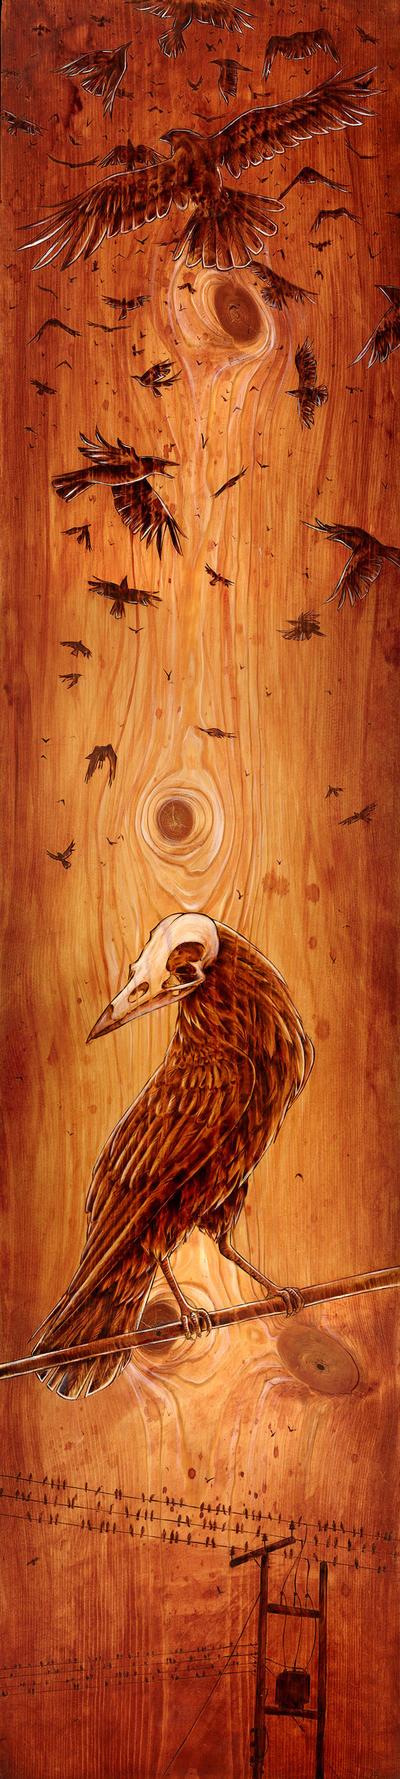 The Birds by Tsairi